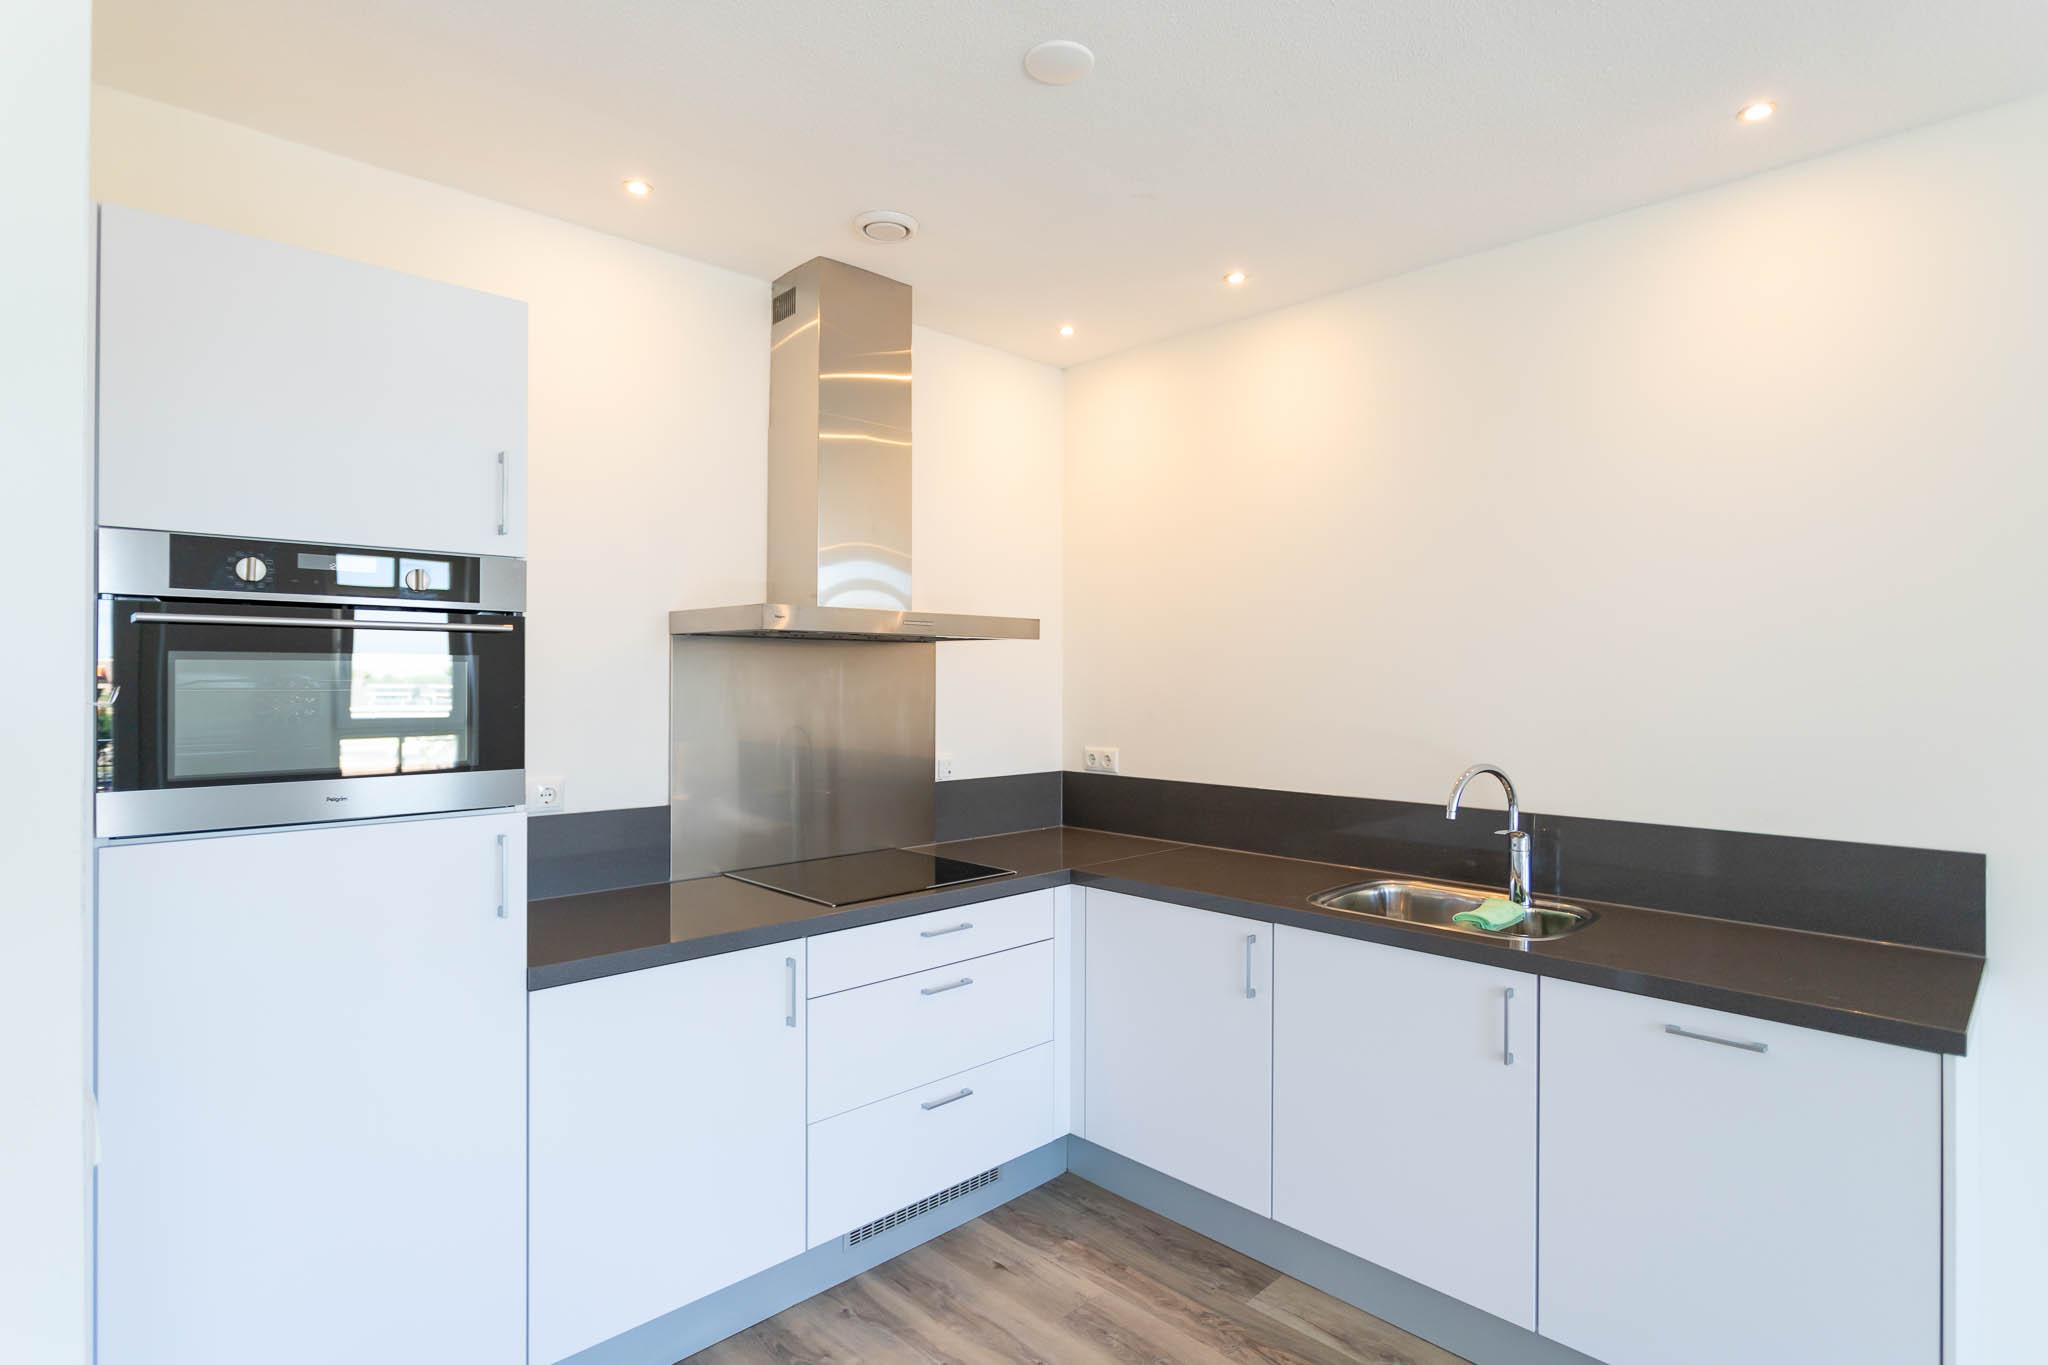 Keuken   Wonen in Calla - De Klok 437